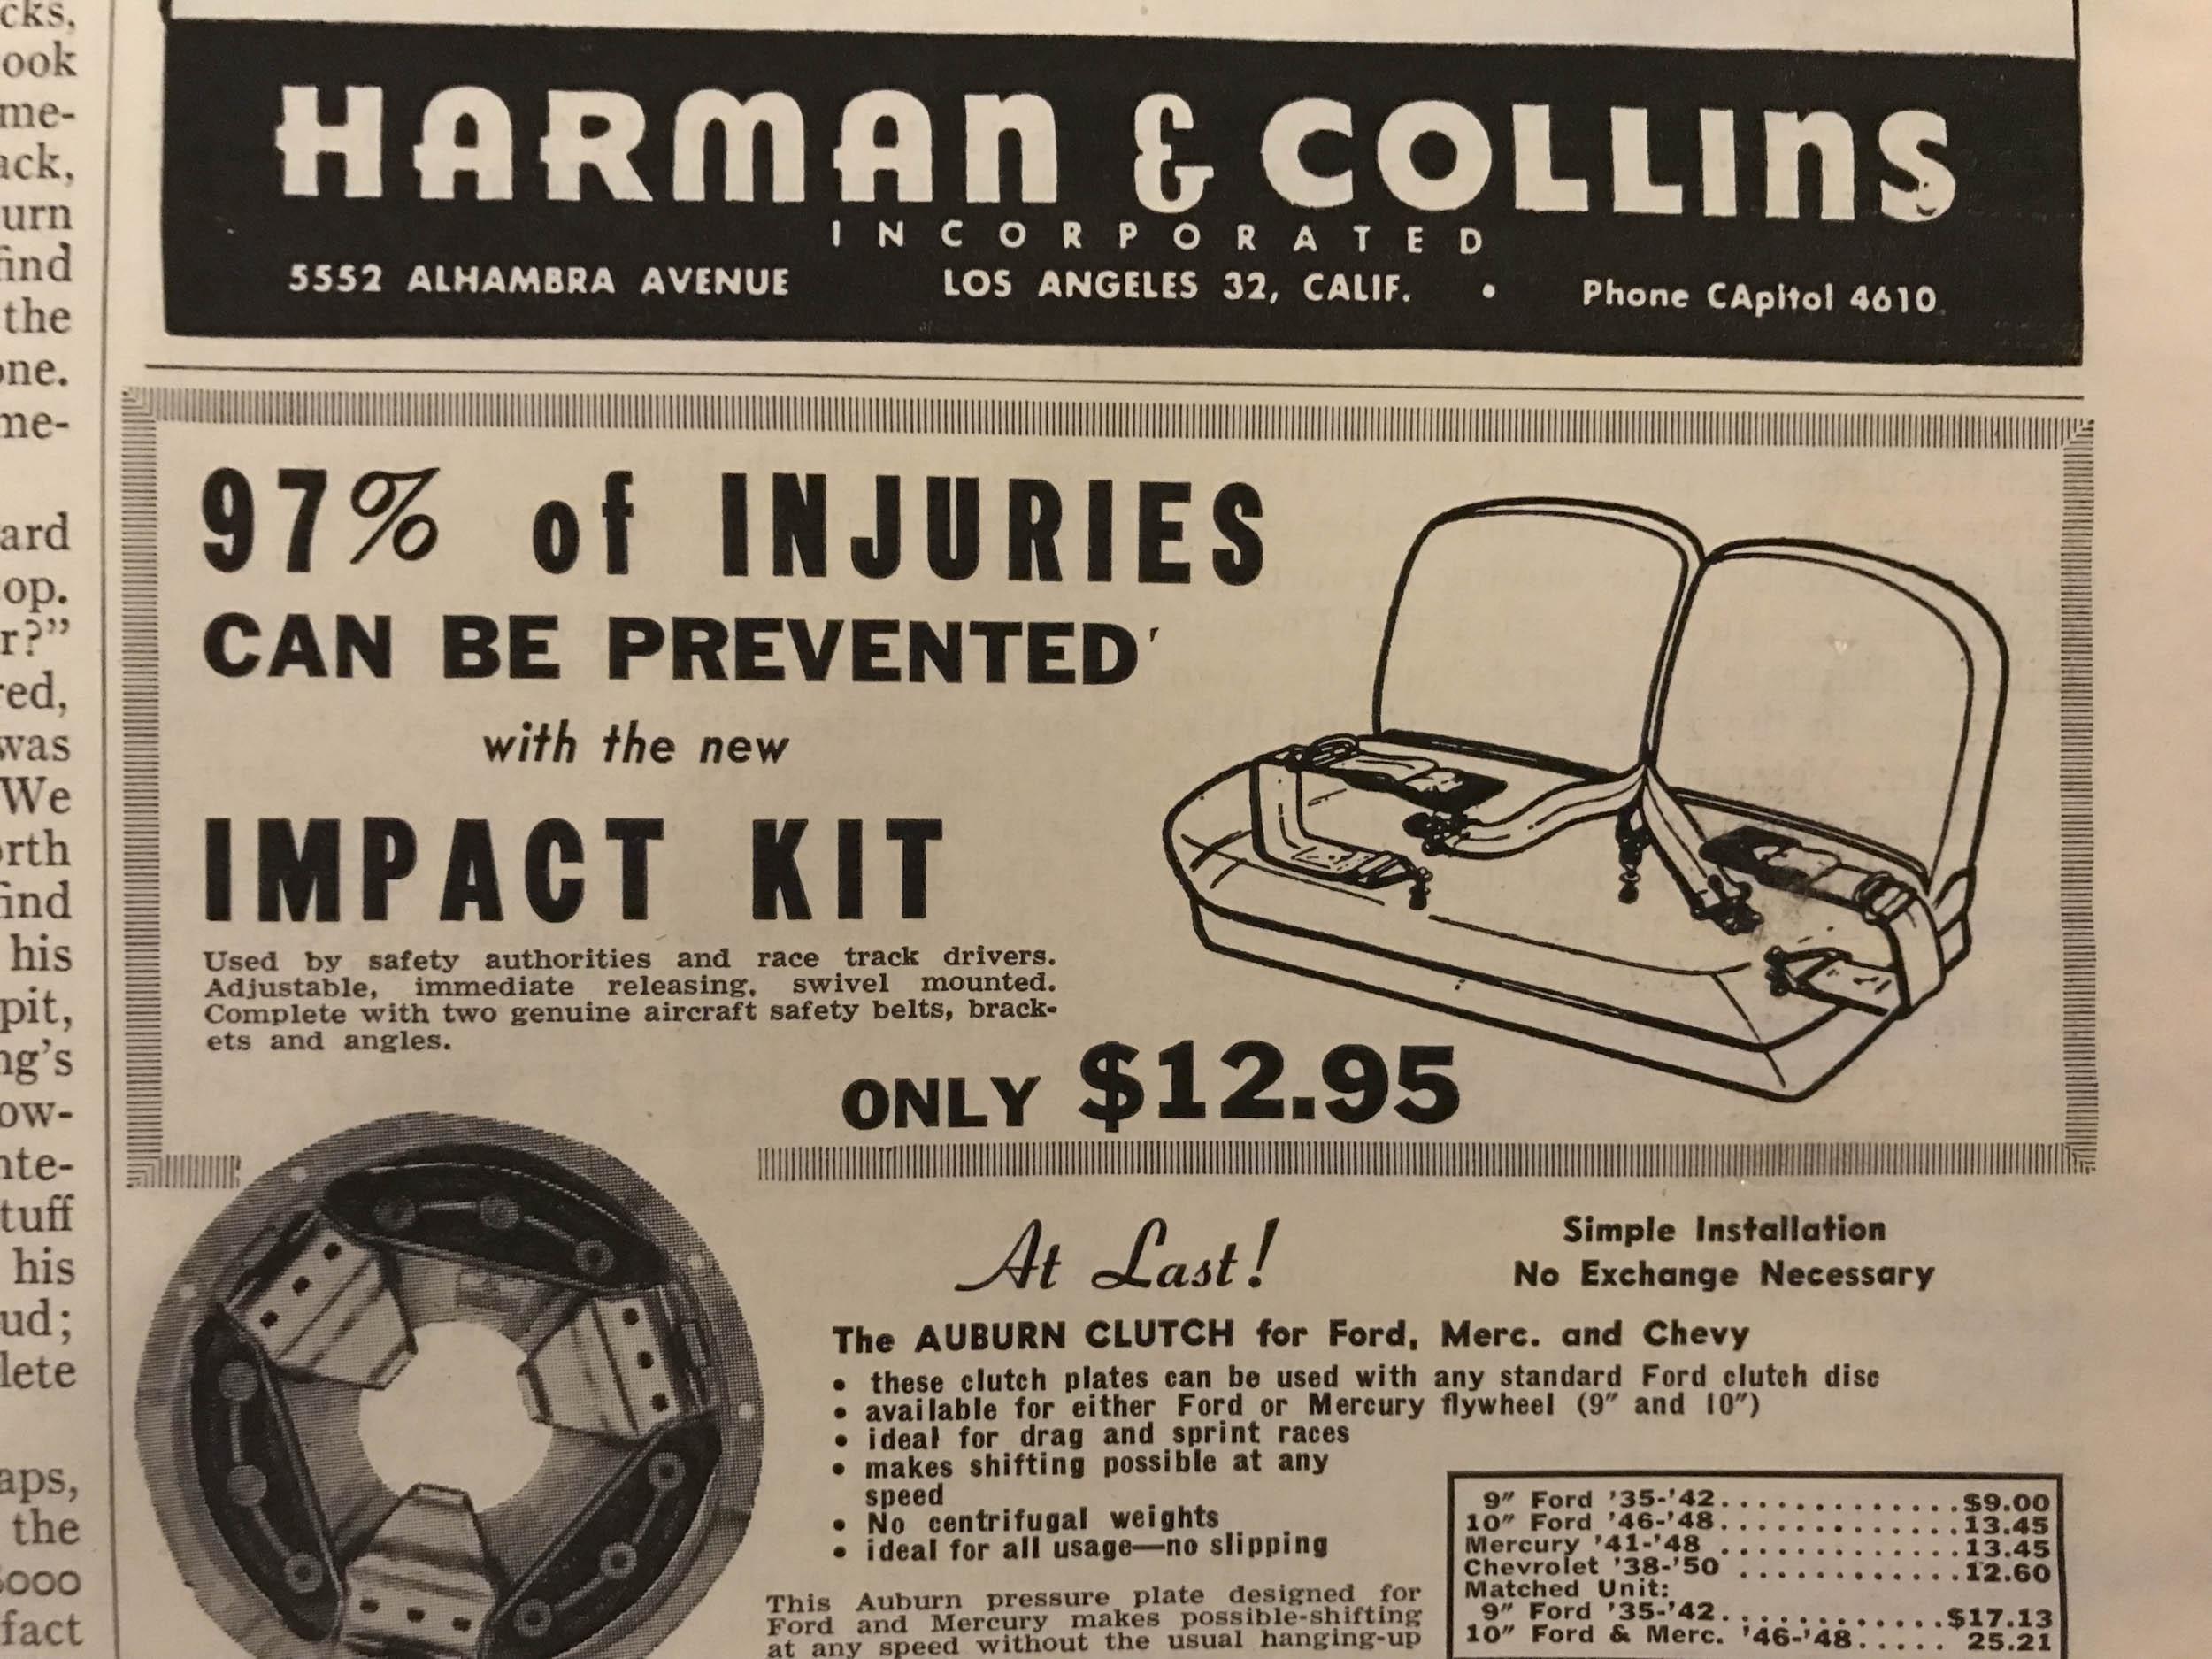 Harman & Collins Impact Kit (1952)